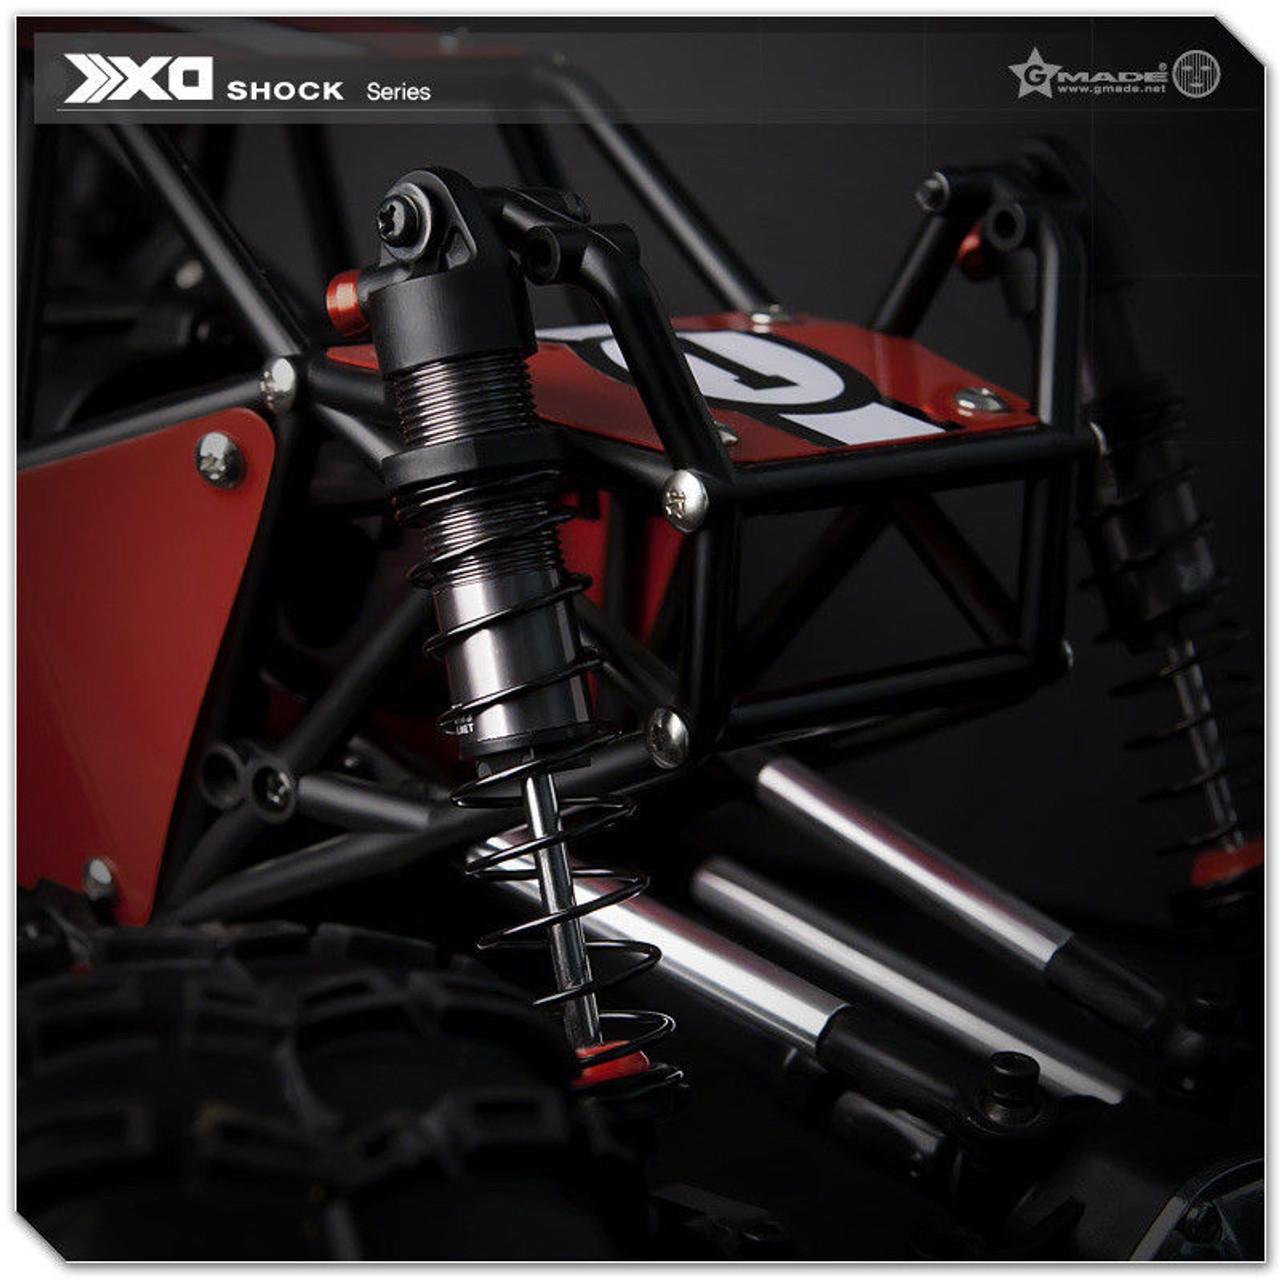 Gmade XD Aeration Shock 62Mm 2 GM21807